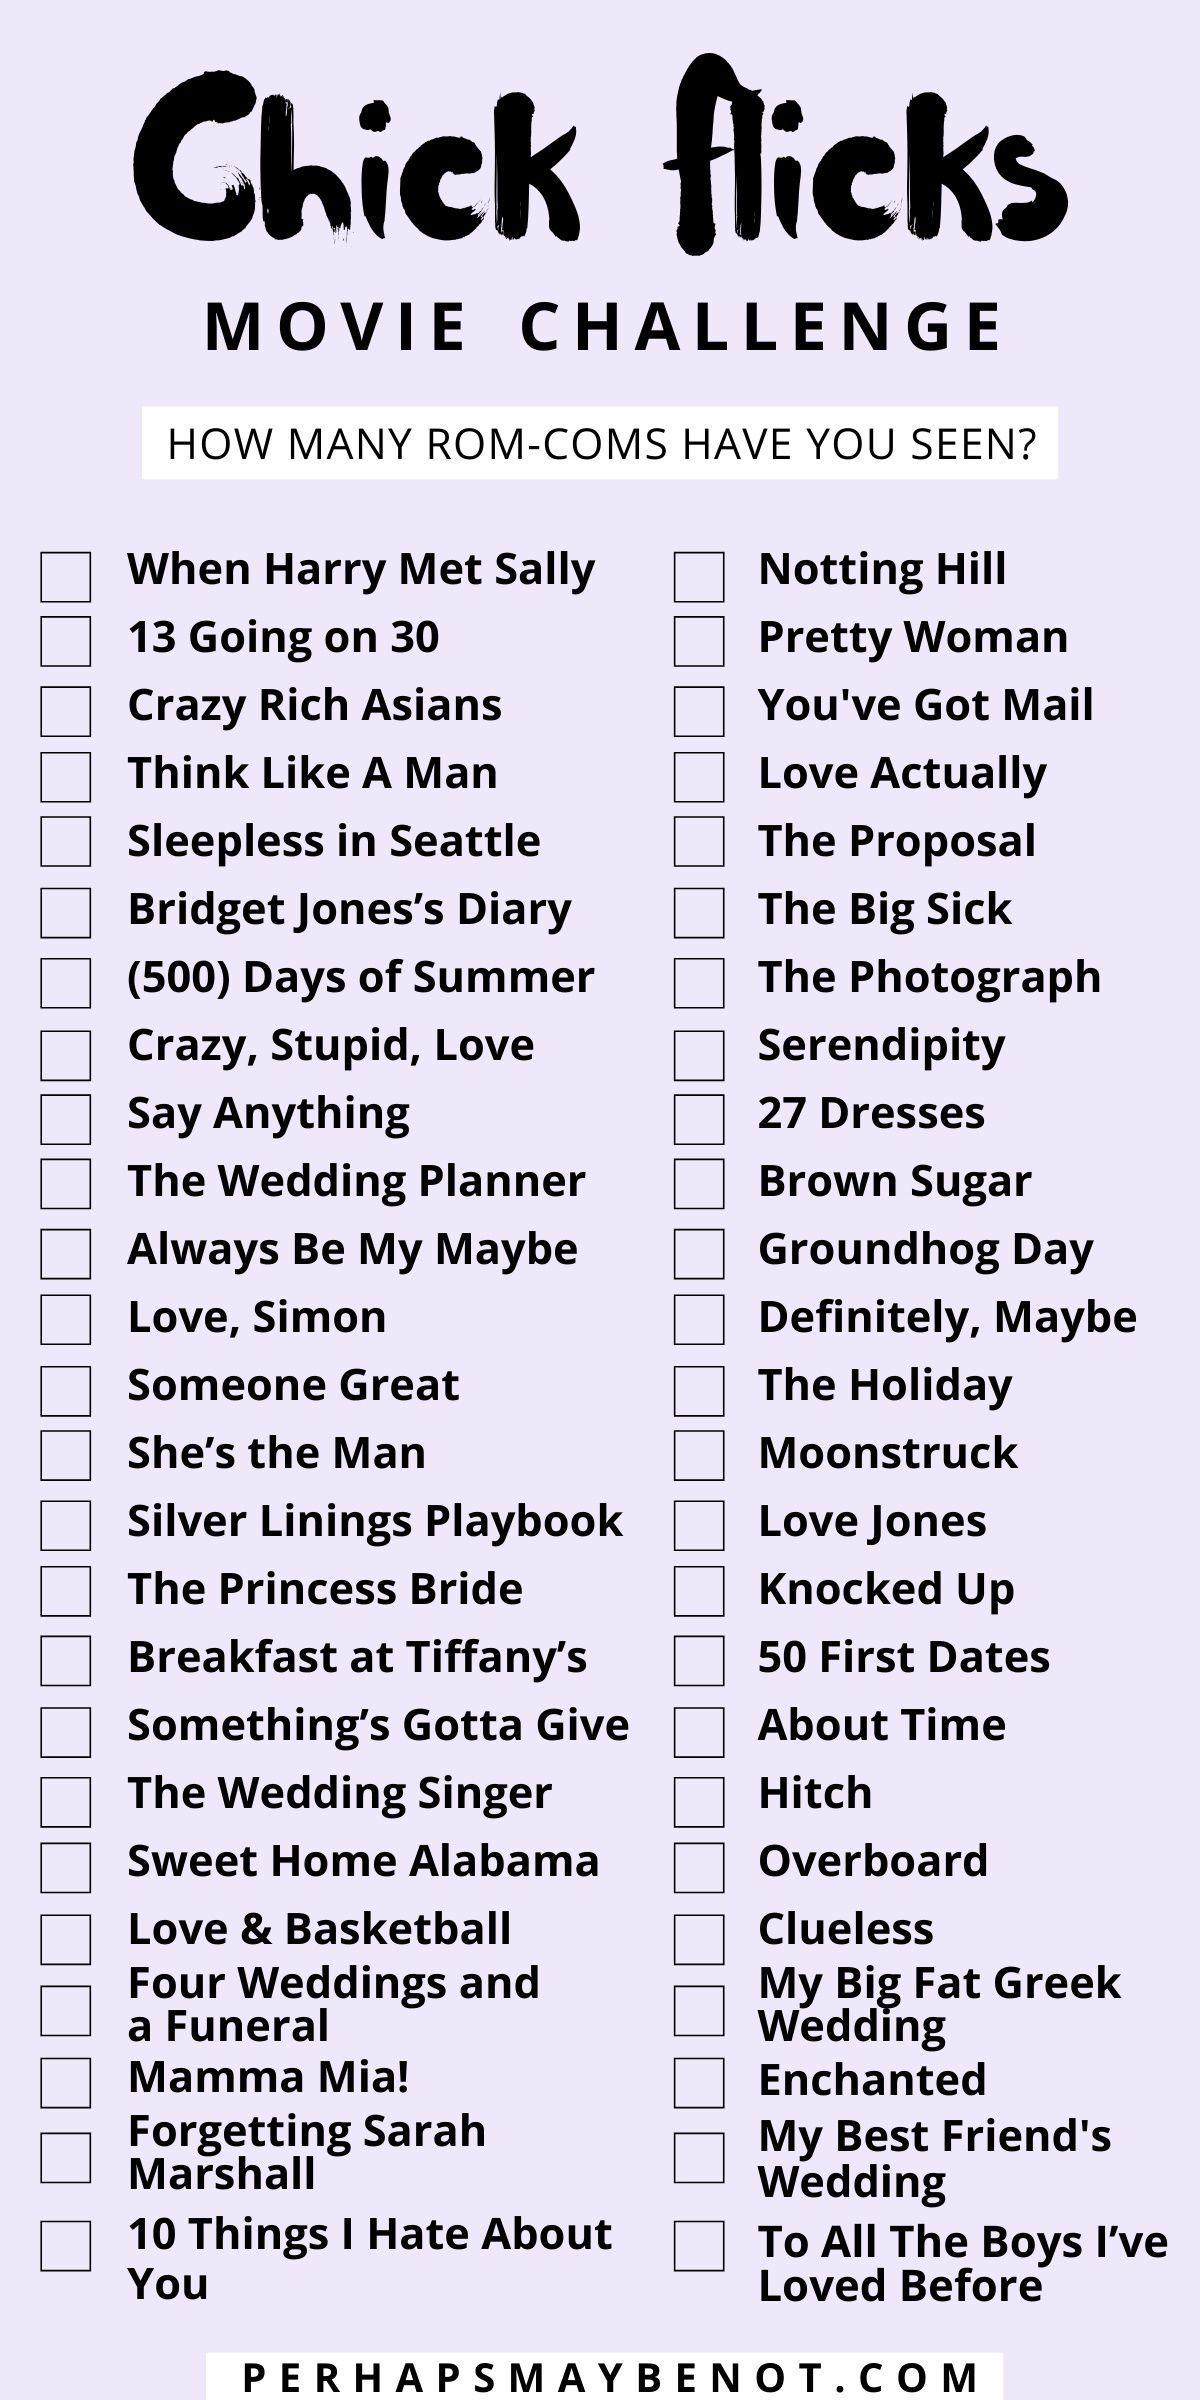 60 Best Romantic Comedies For Movie Night - Perhap